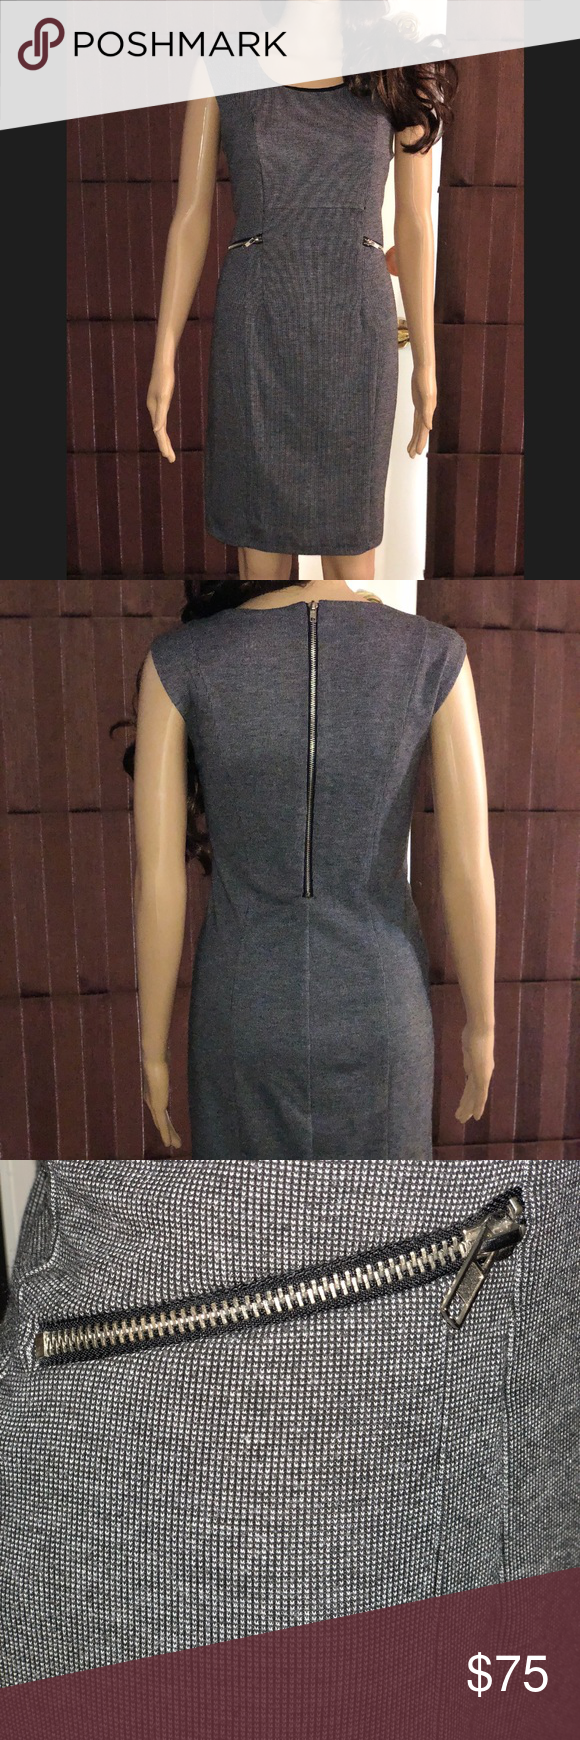 Dress  Valerie bertinelli Gray dress and Gray